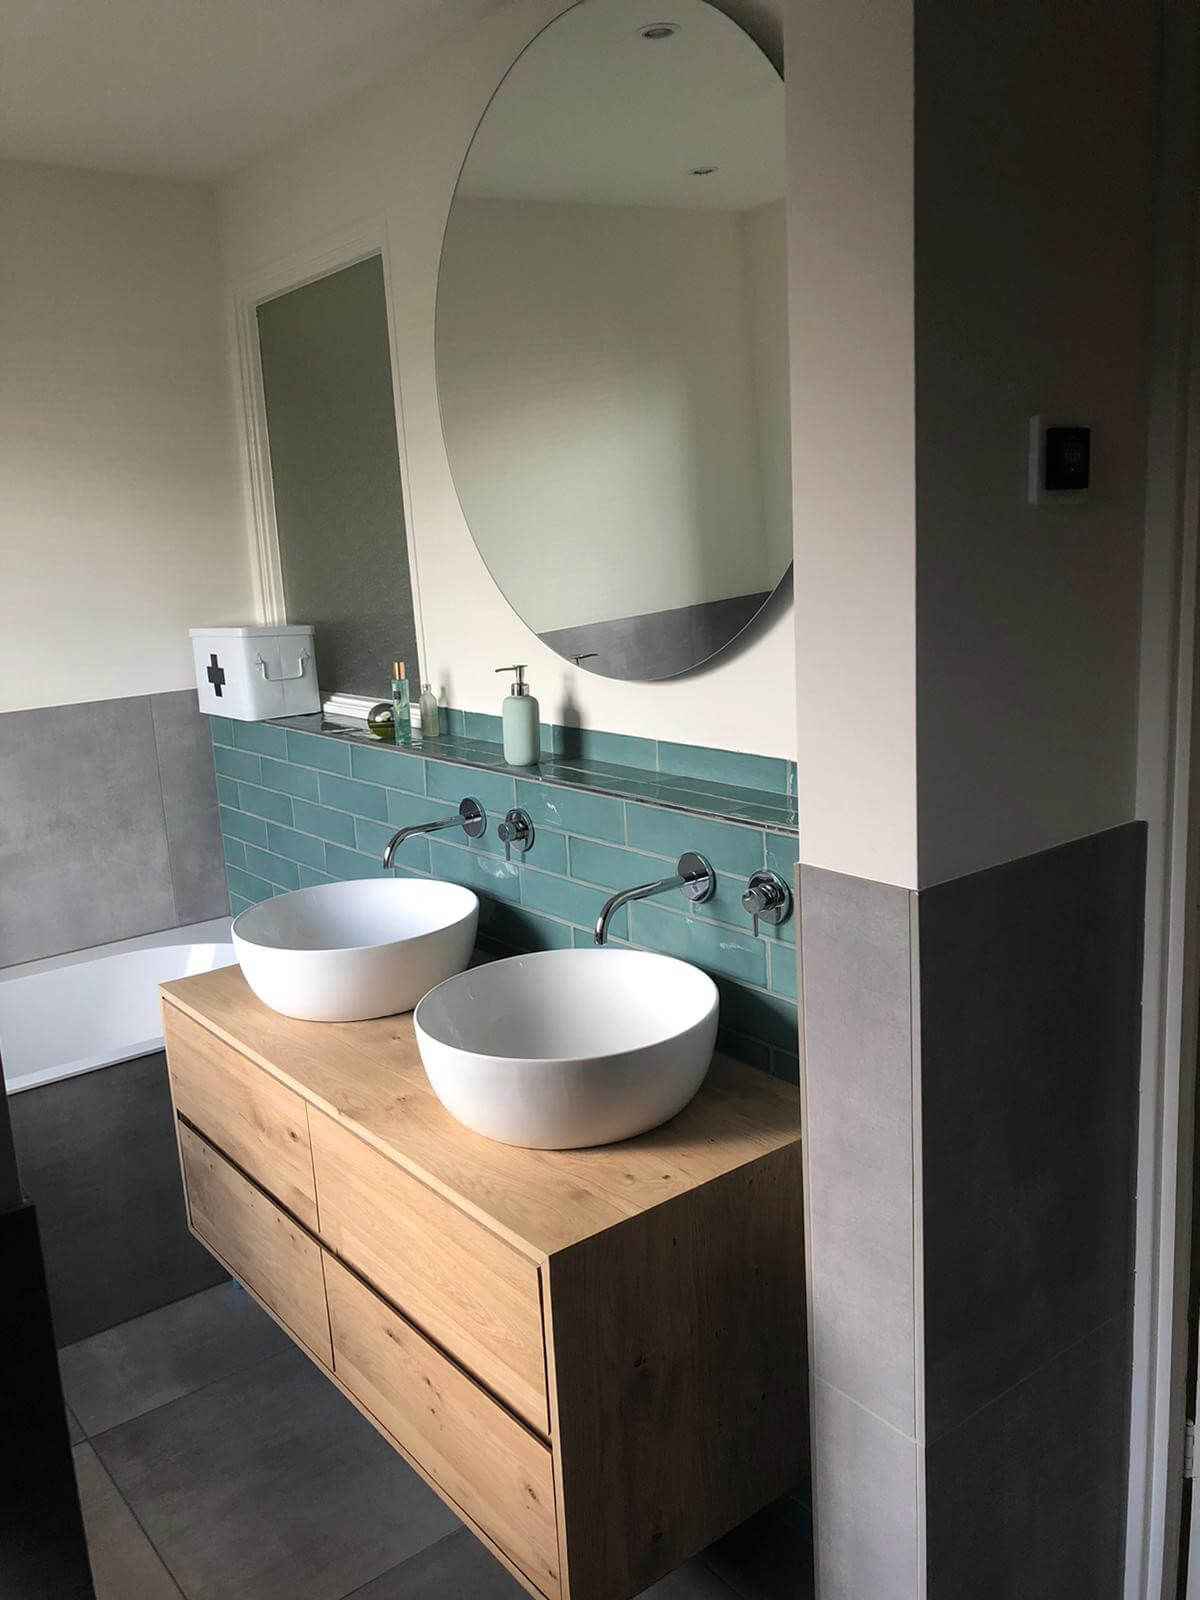 Handgemaakt badkamermeubel brederostraat Zwolle